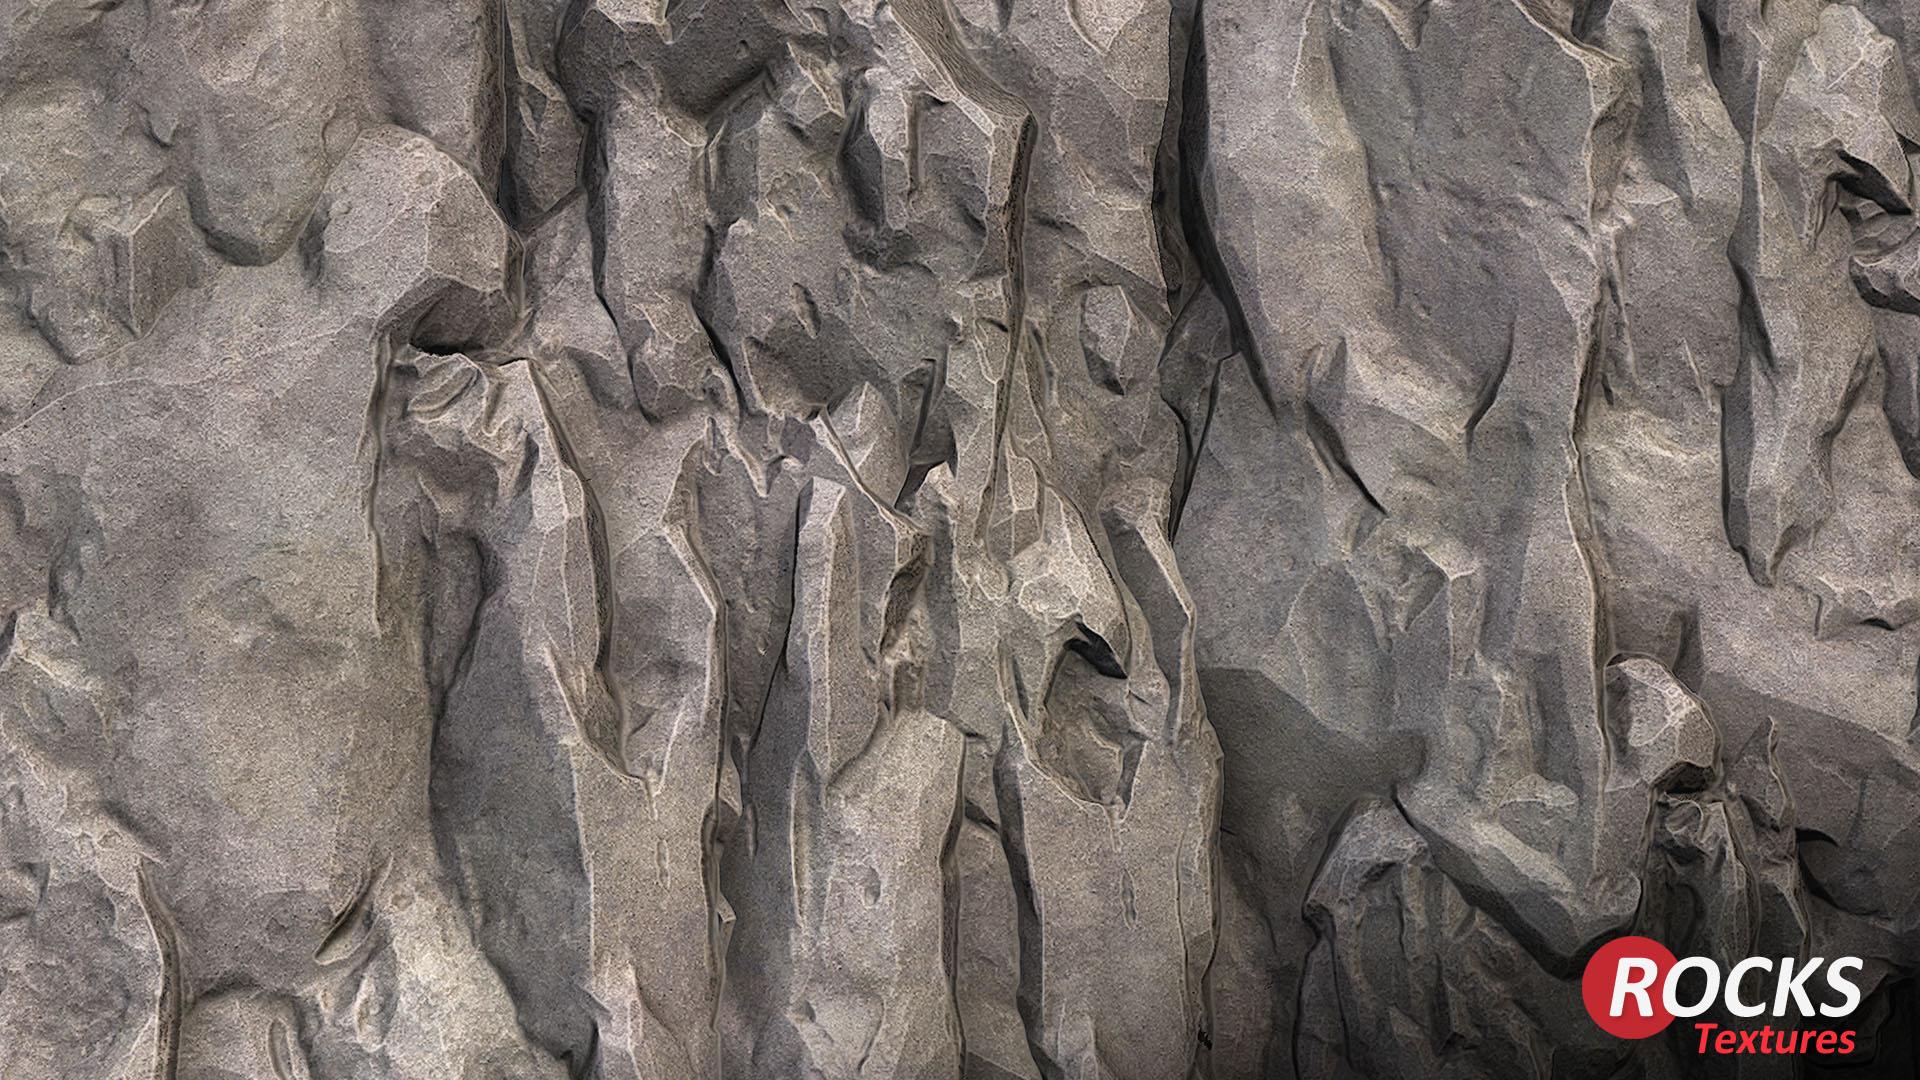 rock_stone_sculpted_textures_04.jpg